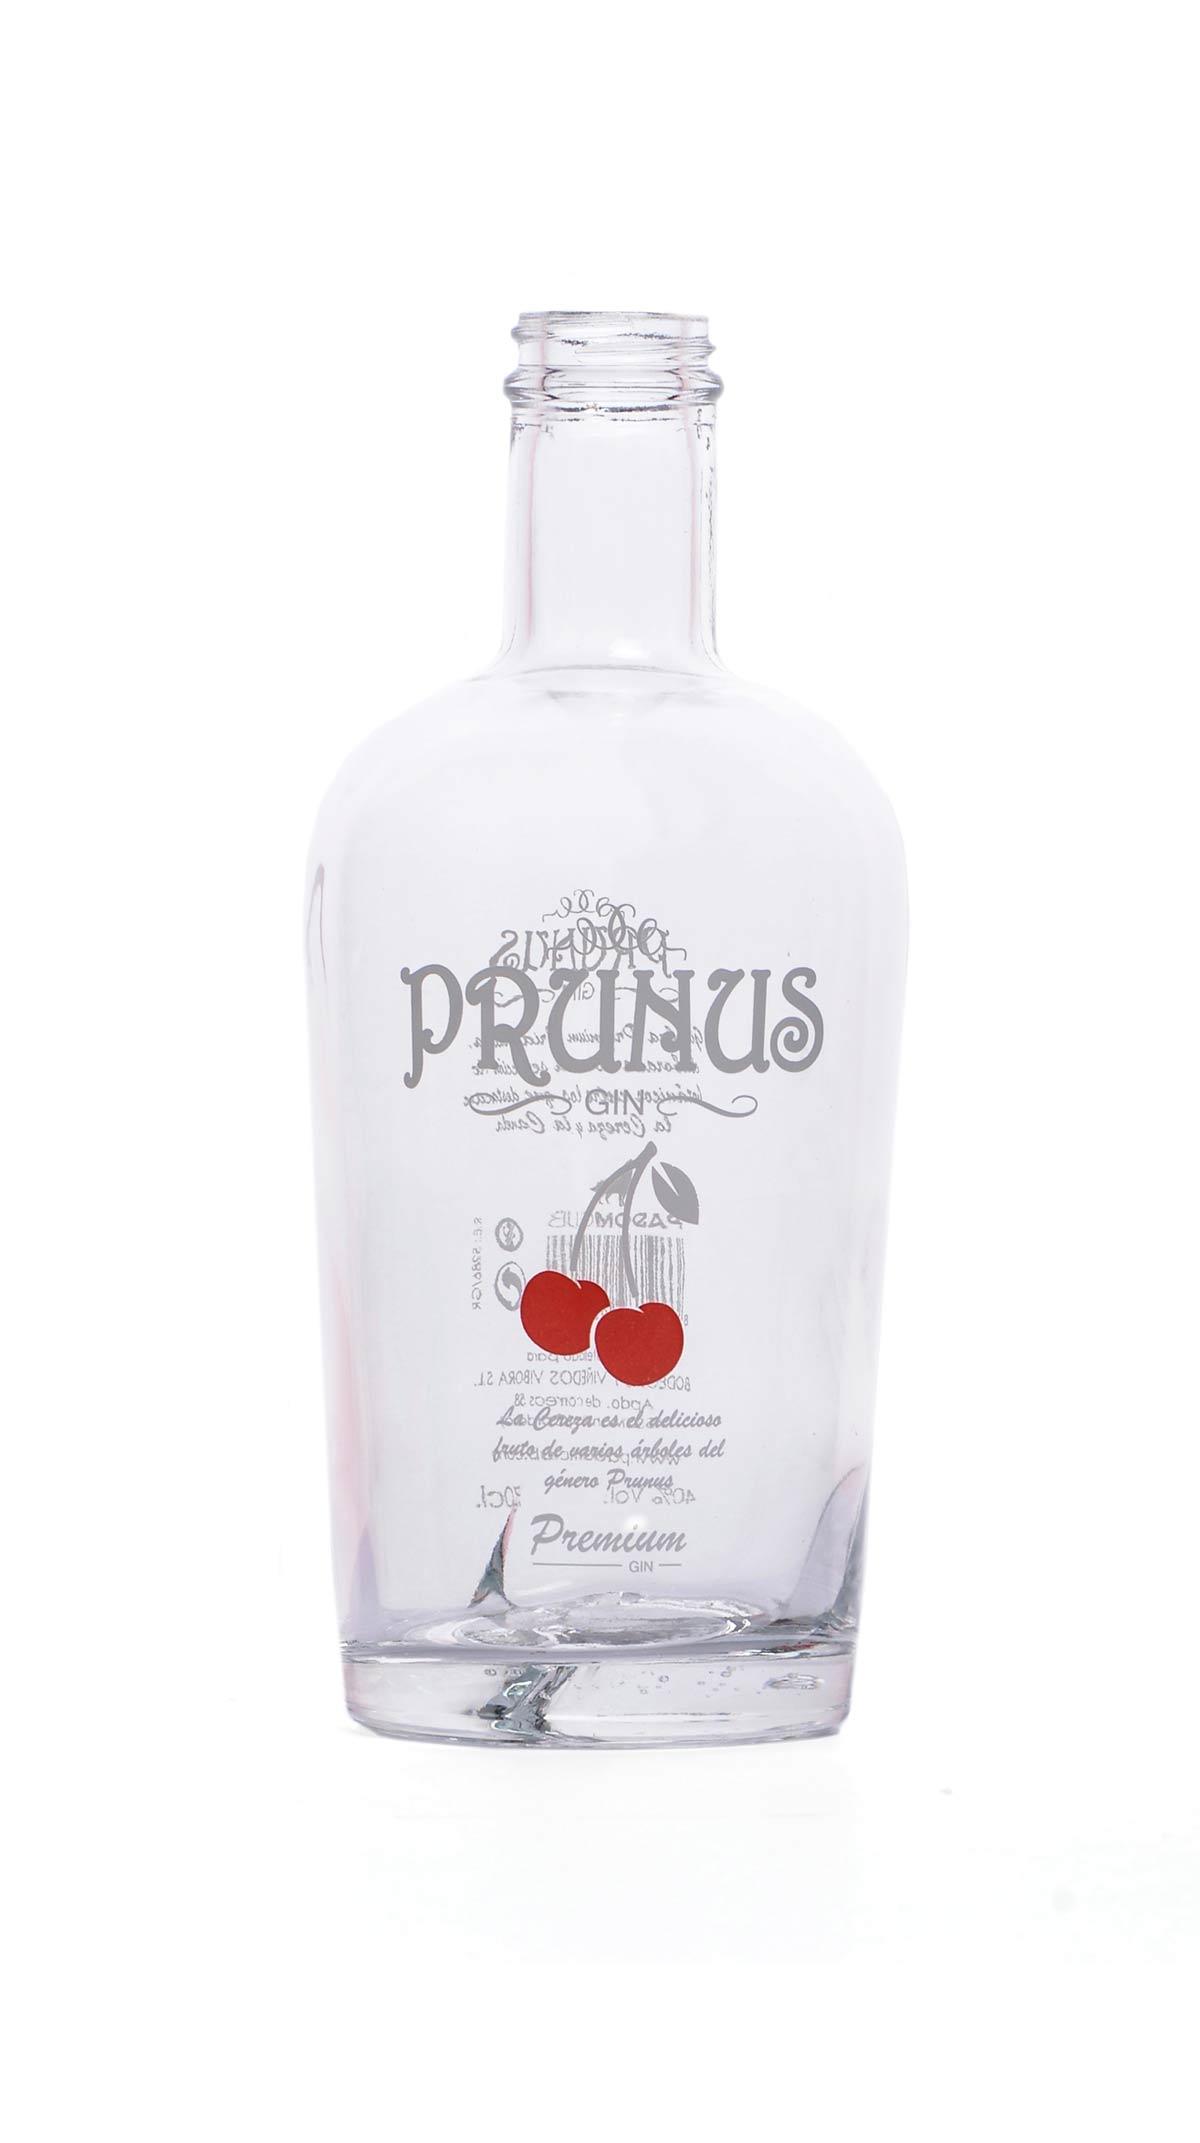 Prunus Premium Gin - Serigrafía Casbe